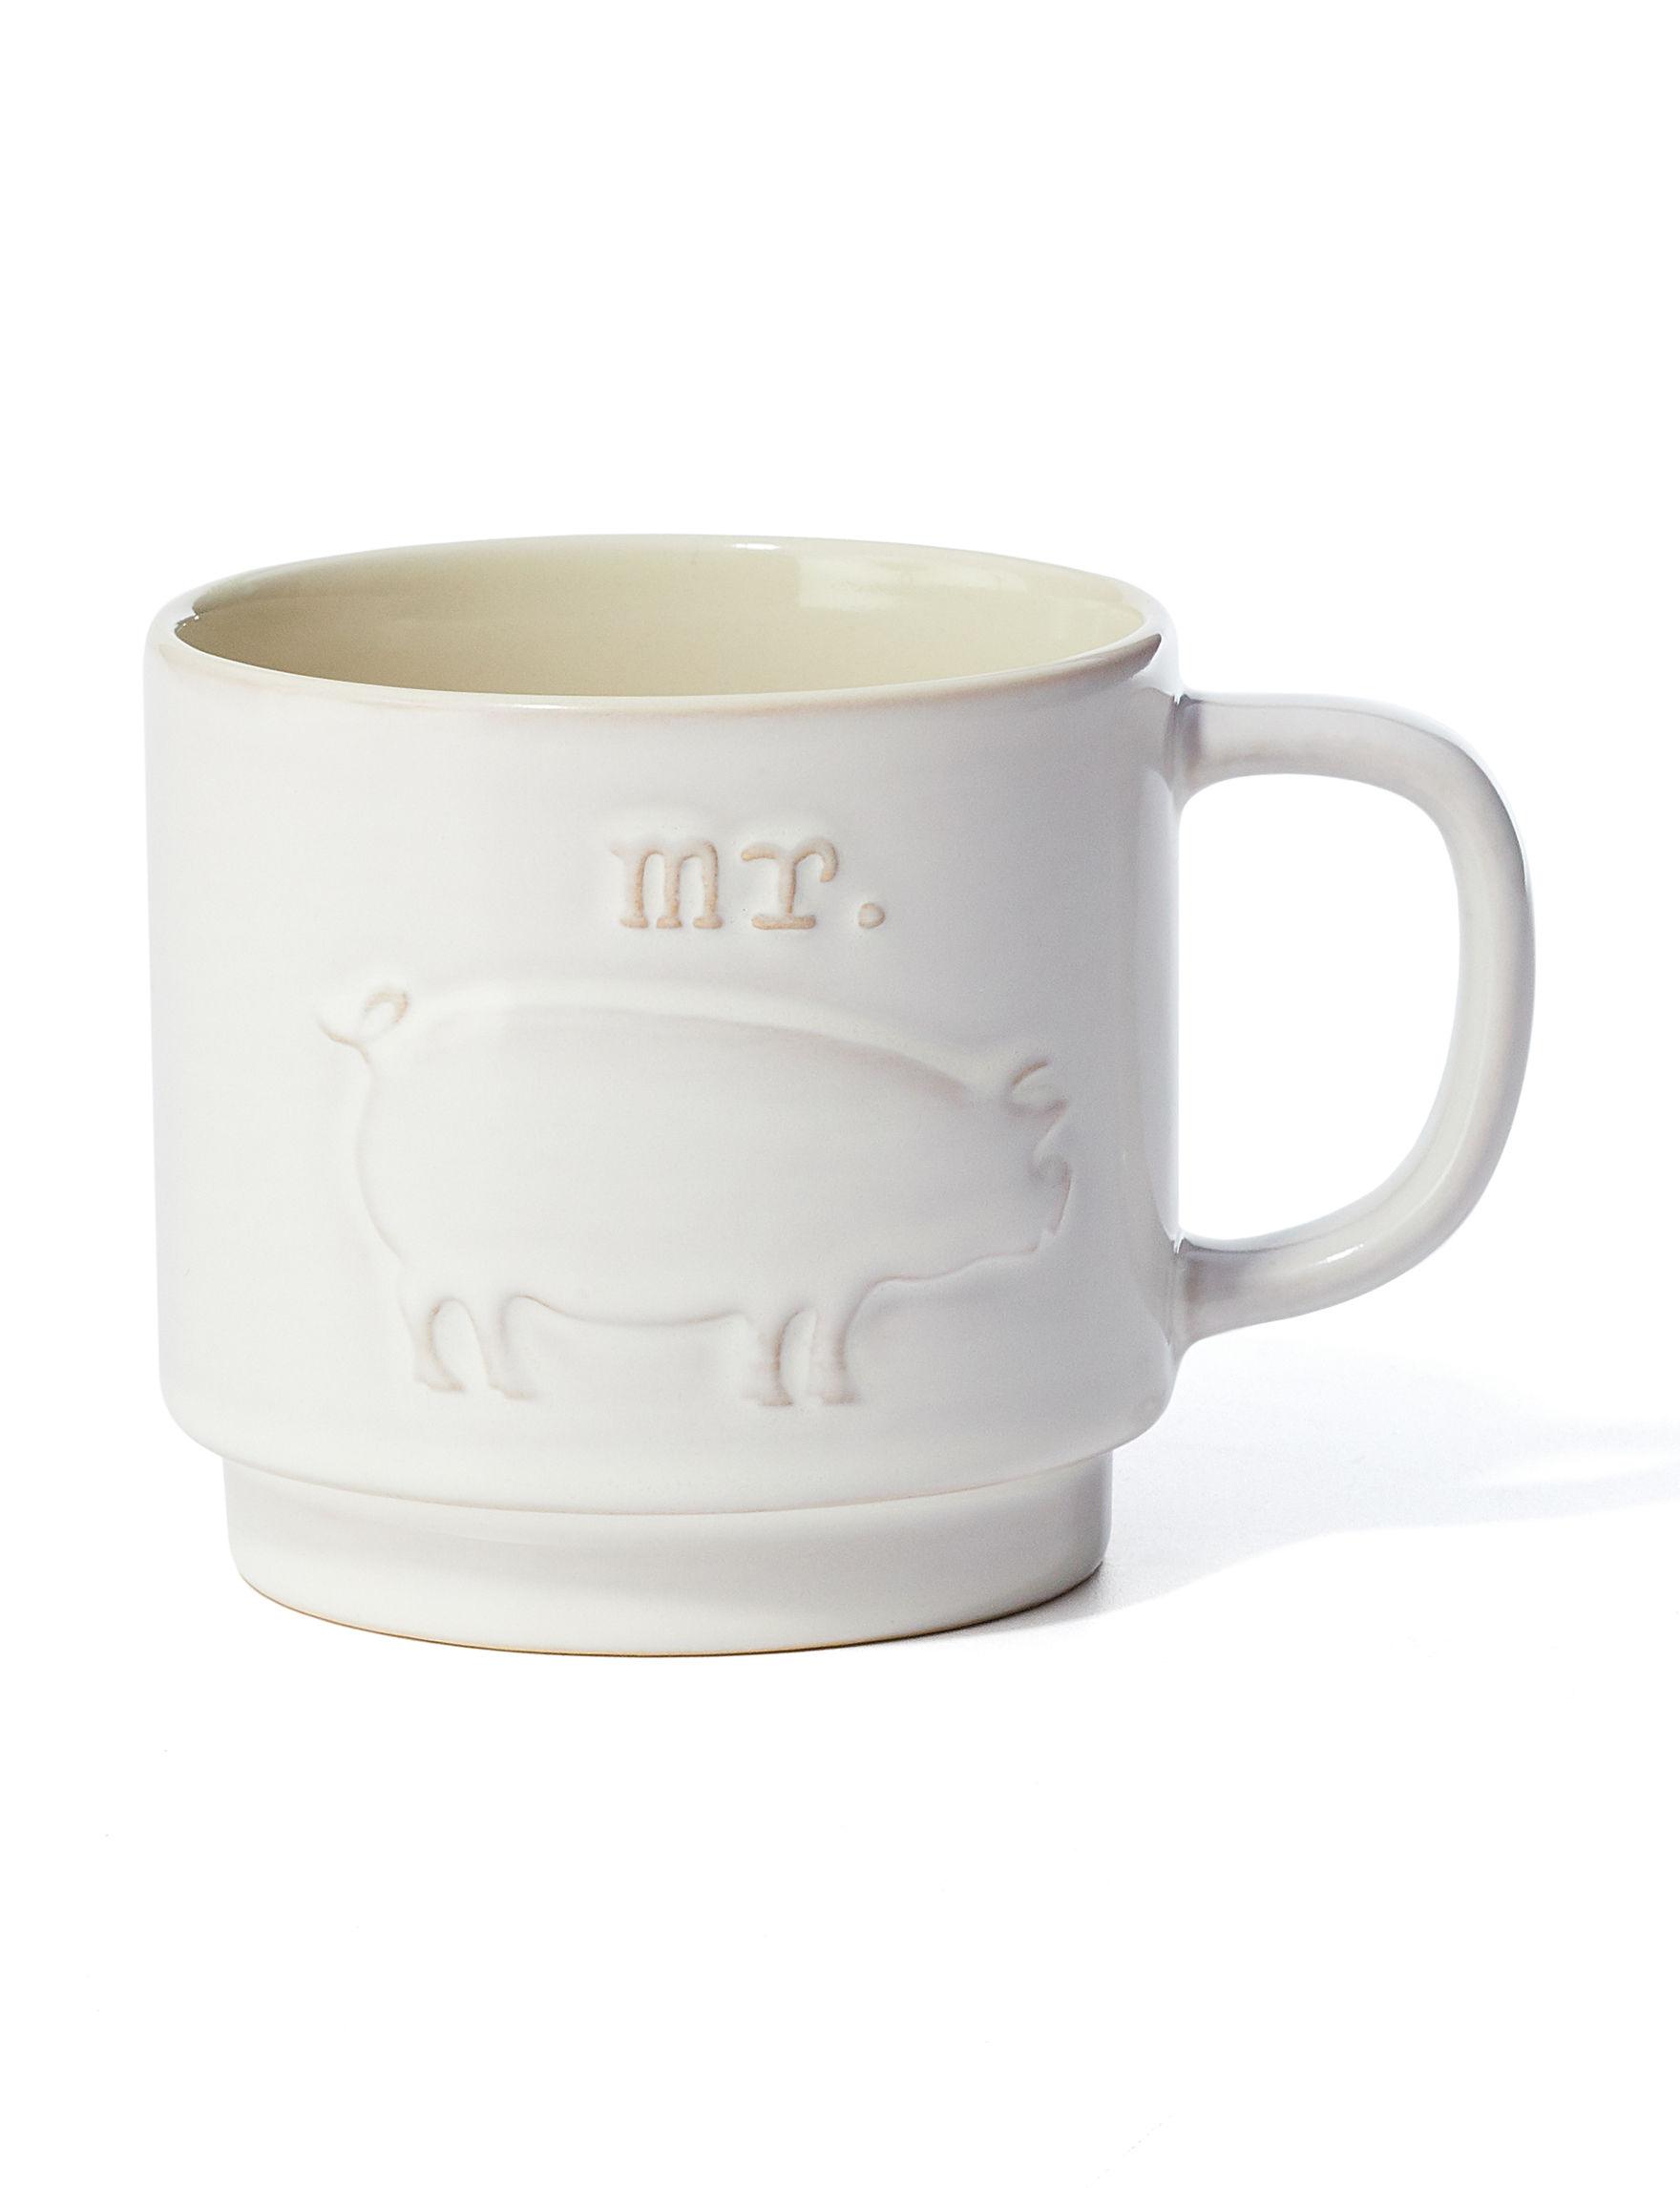 Enchante White Mugs Drinkware